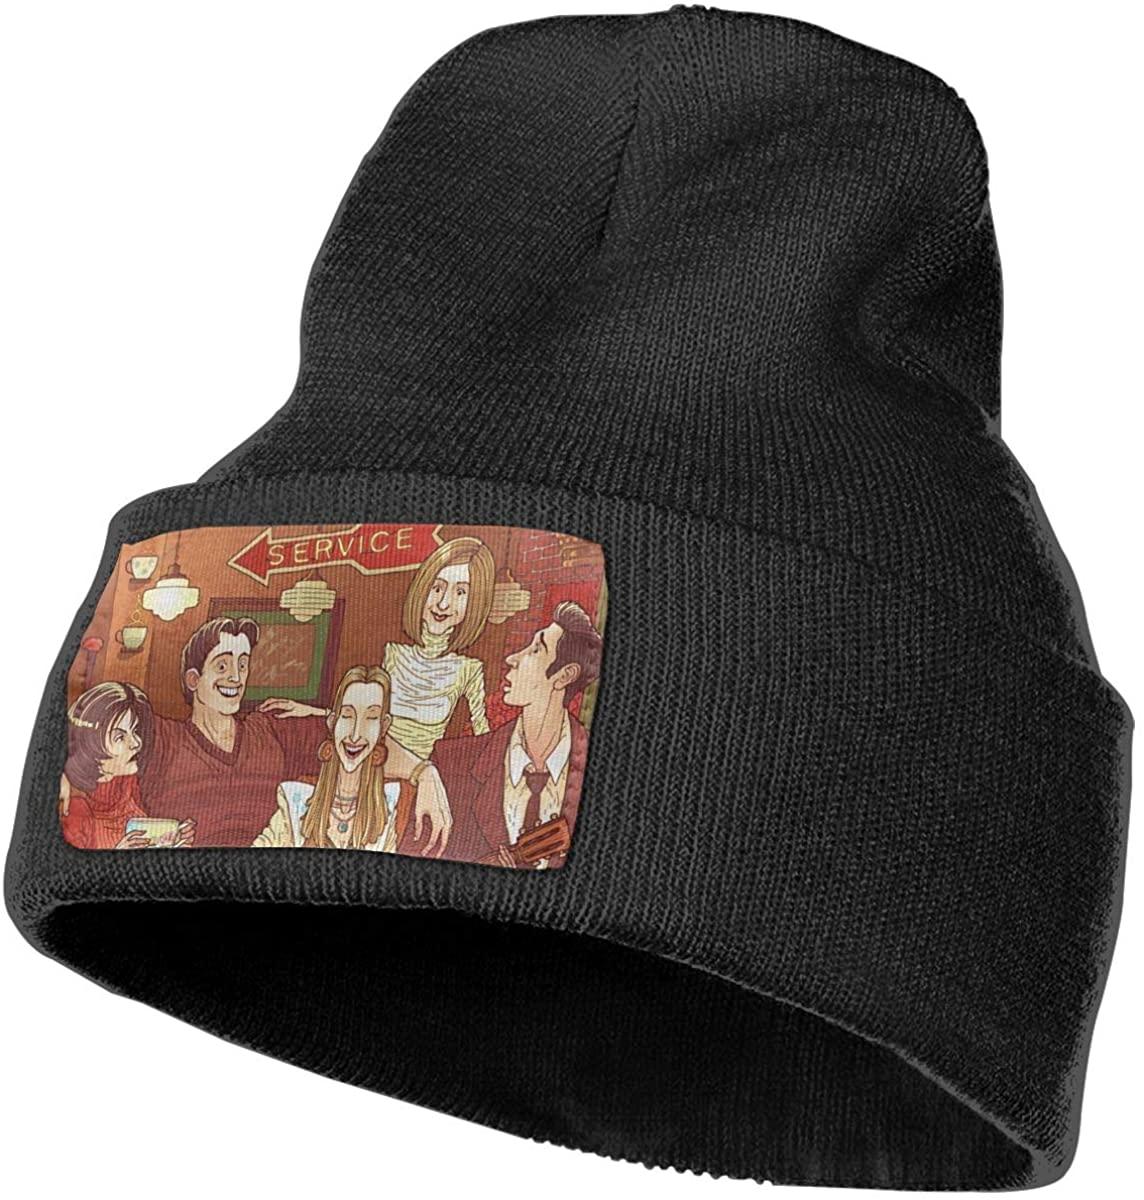 Gerneric Friends Unisex Fall Winter Warm Knit Cap Beanie Hat Stretchy Ski Cap, 18x30 cm Black